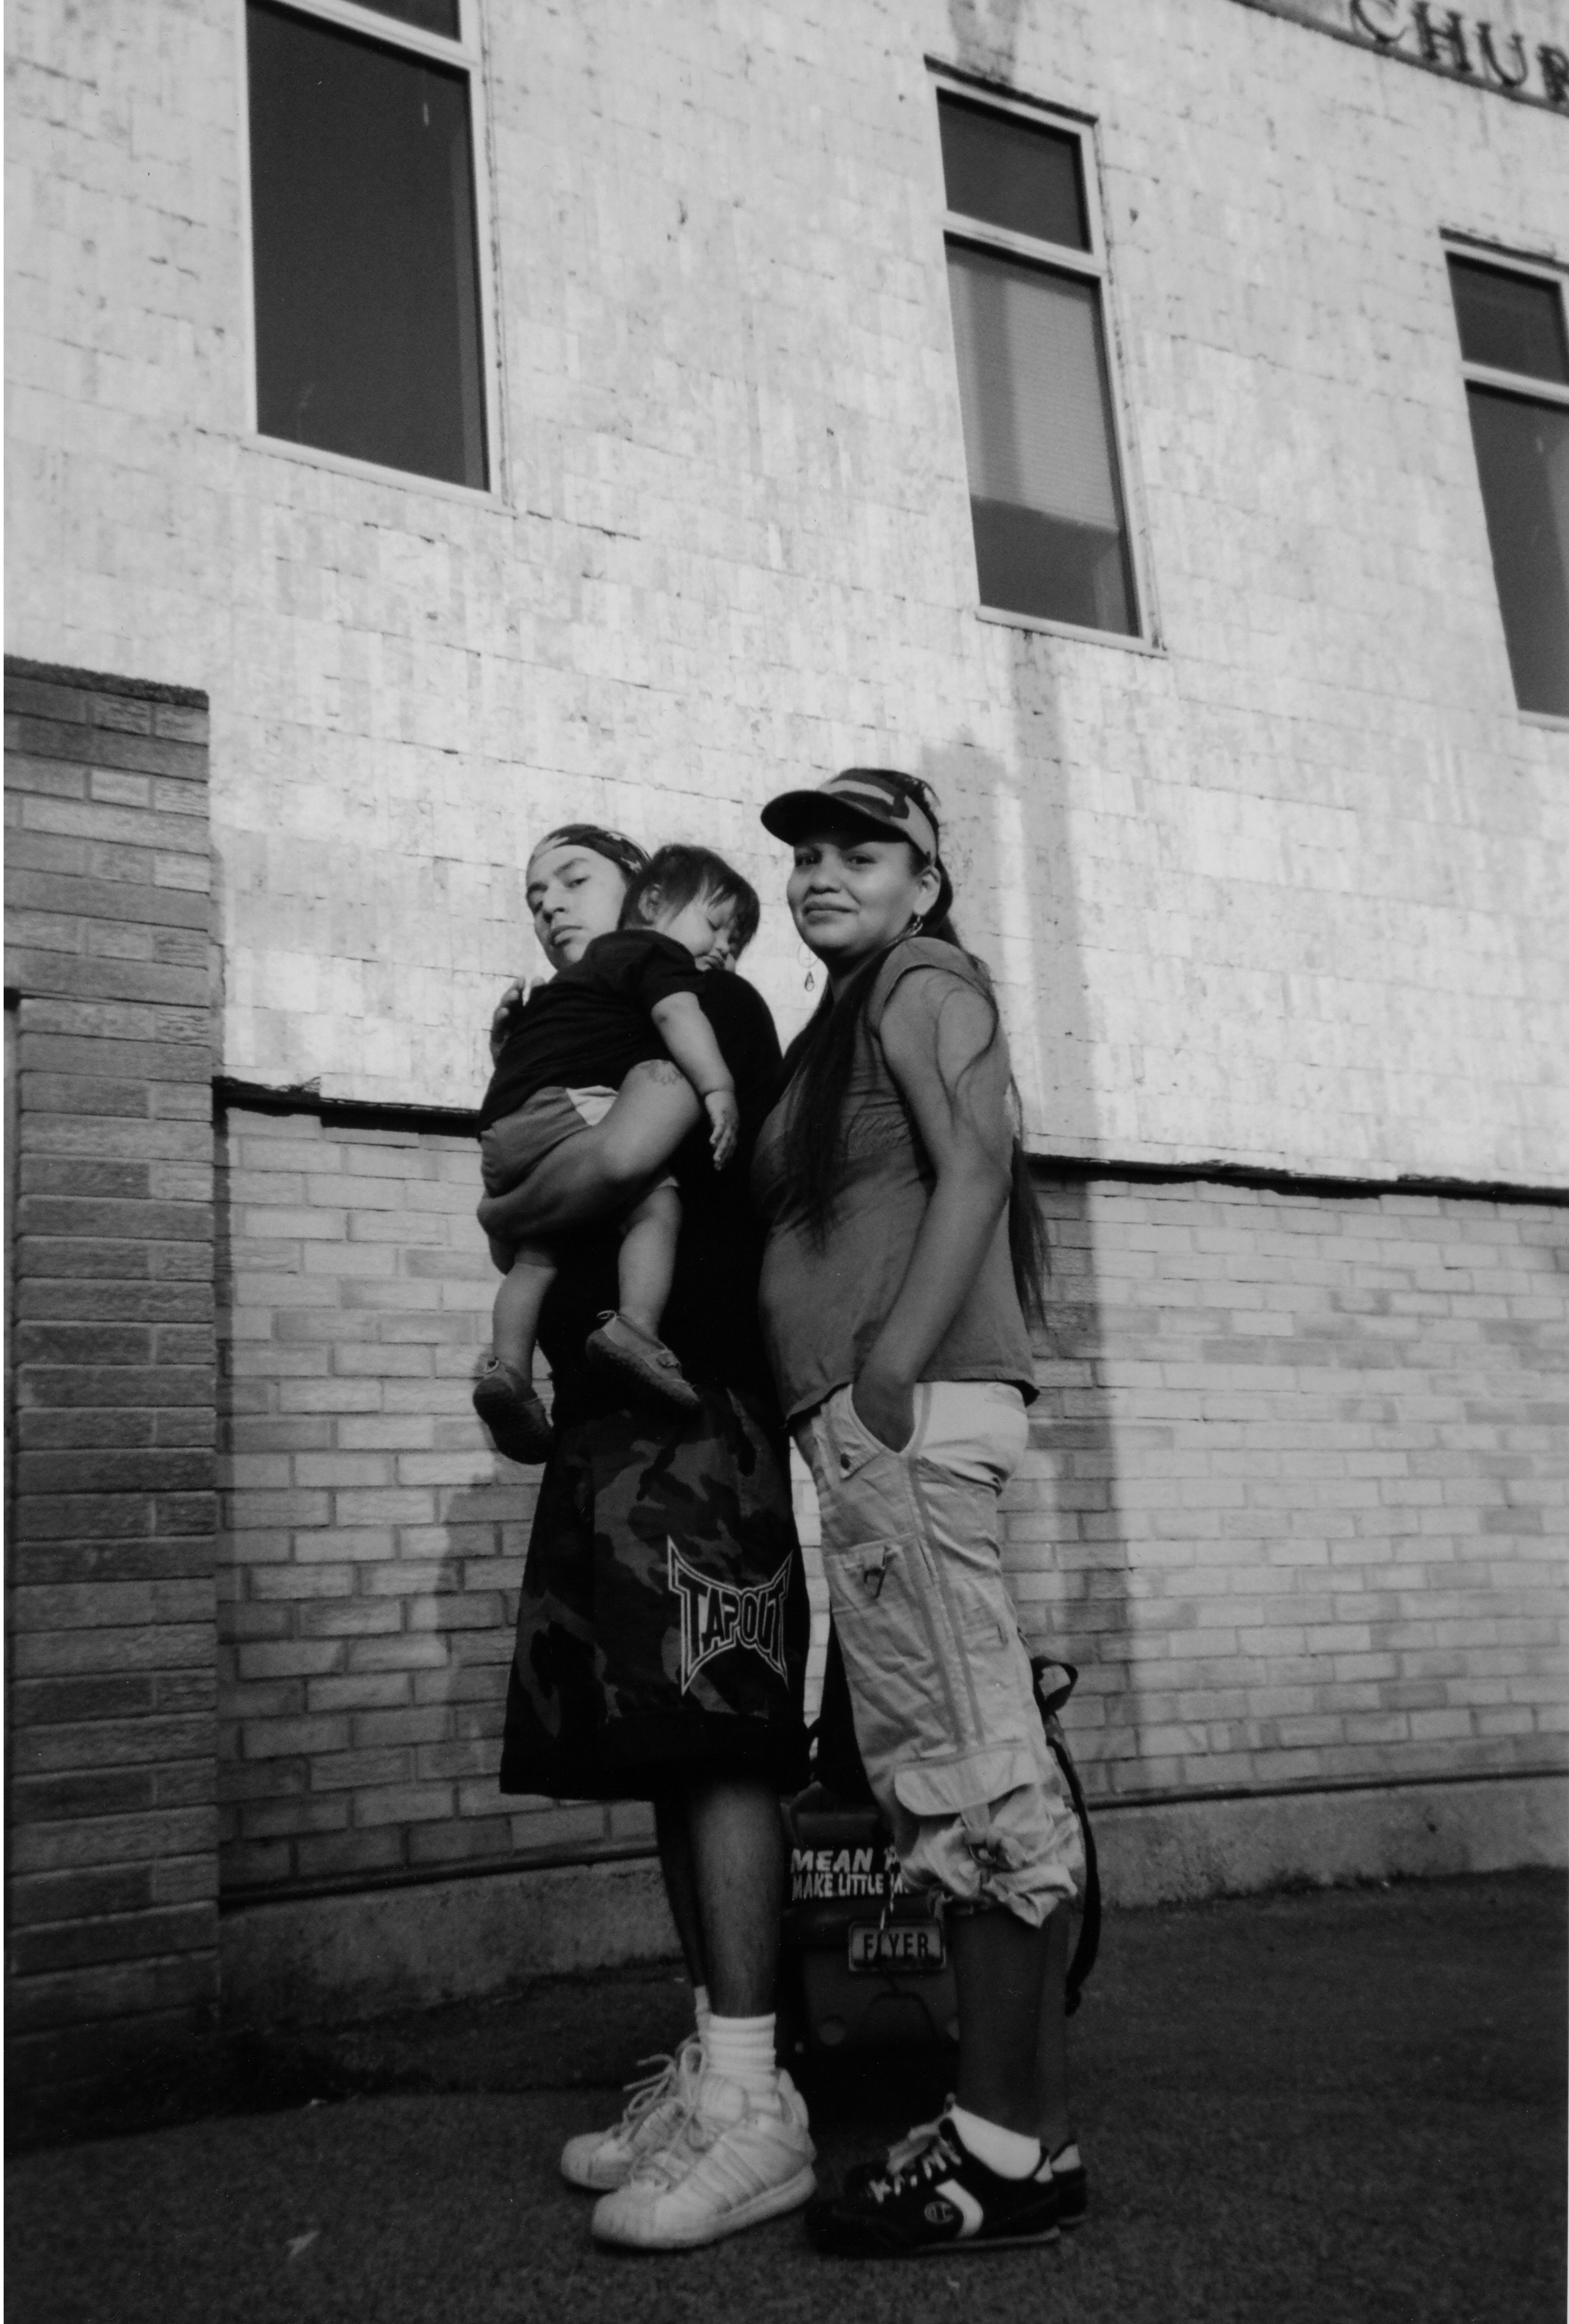 2009-BW-032-Azrael-Aboriginal_Family.jpg